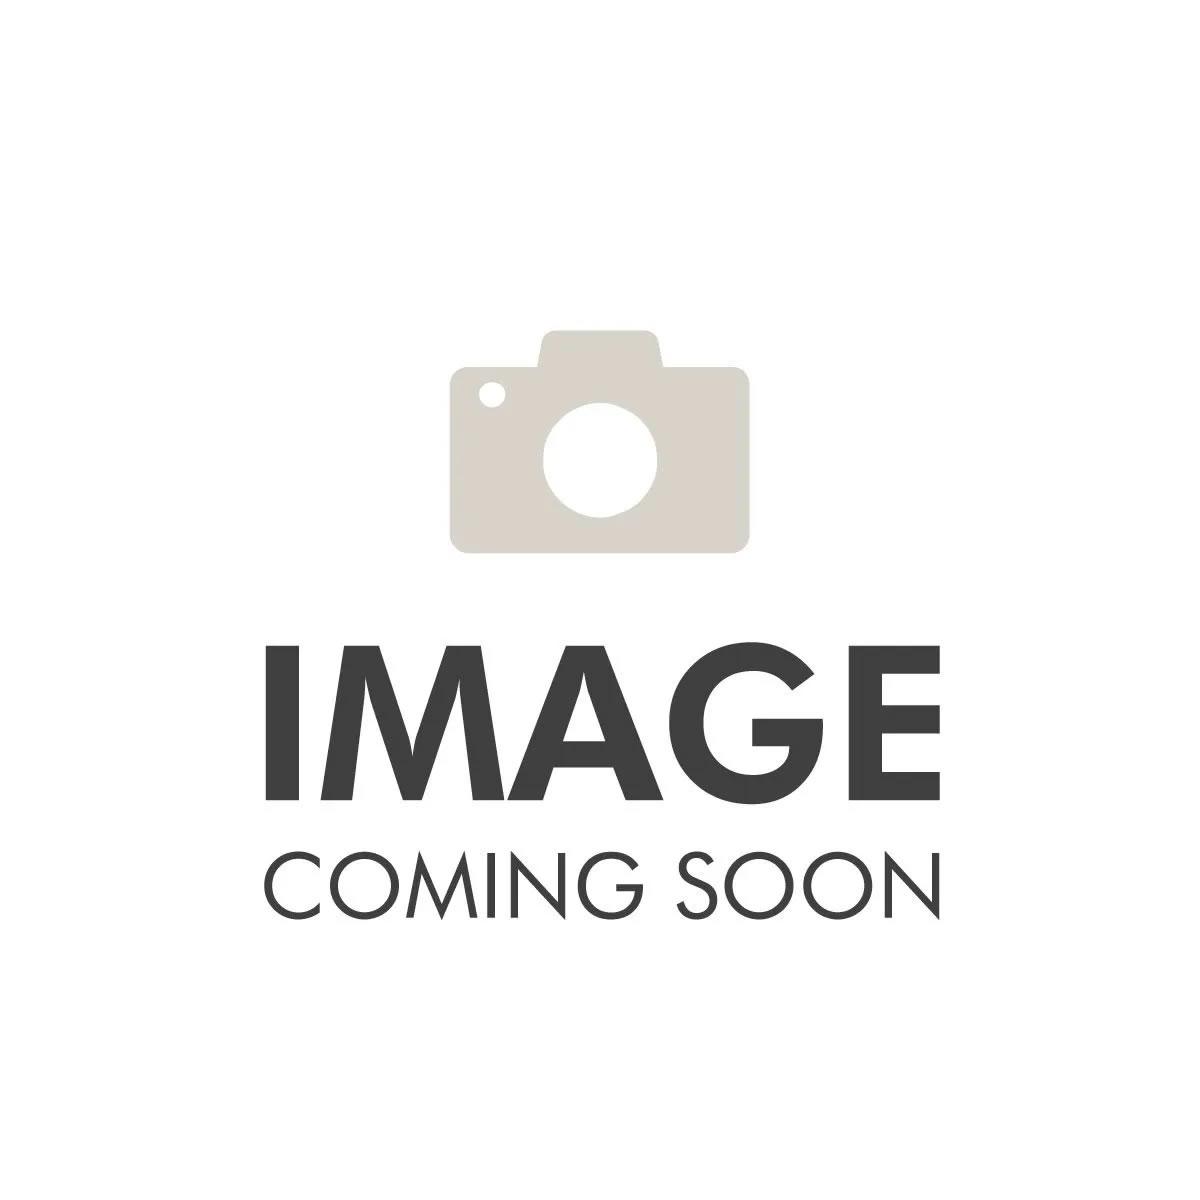 3 Inch Tubular Bumper and Side Step Kit, Black; 76-86 Jeep CJ7/CJ8